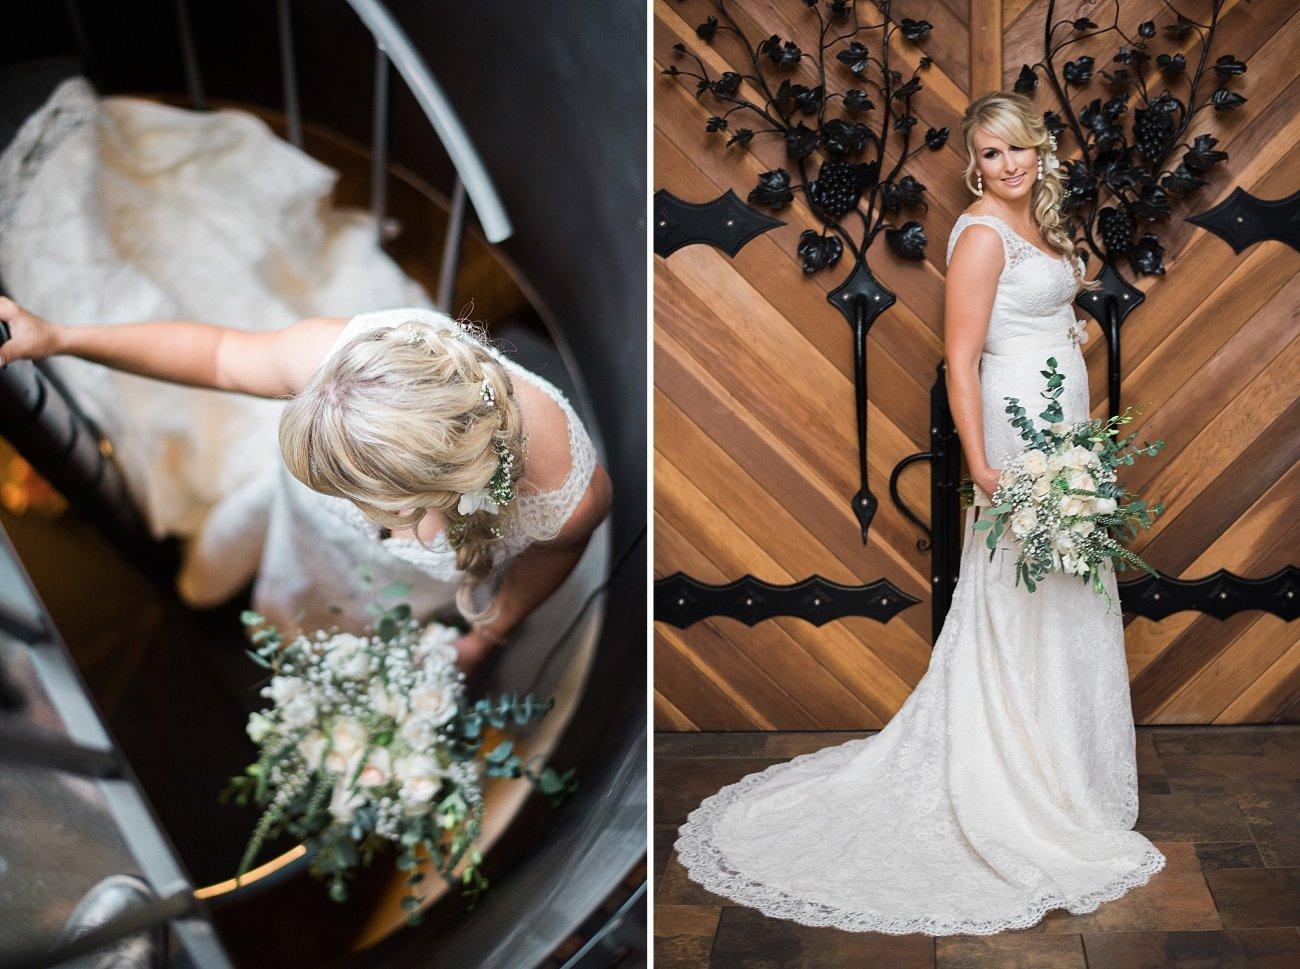 Erin + Marcel Third Element Photography & Cinema Fresno County Estate Wedding Hybrid Film Wedding Photographer_0015